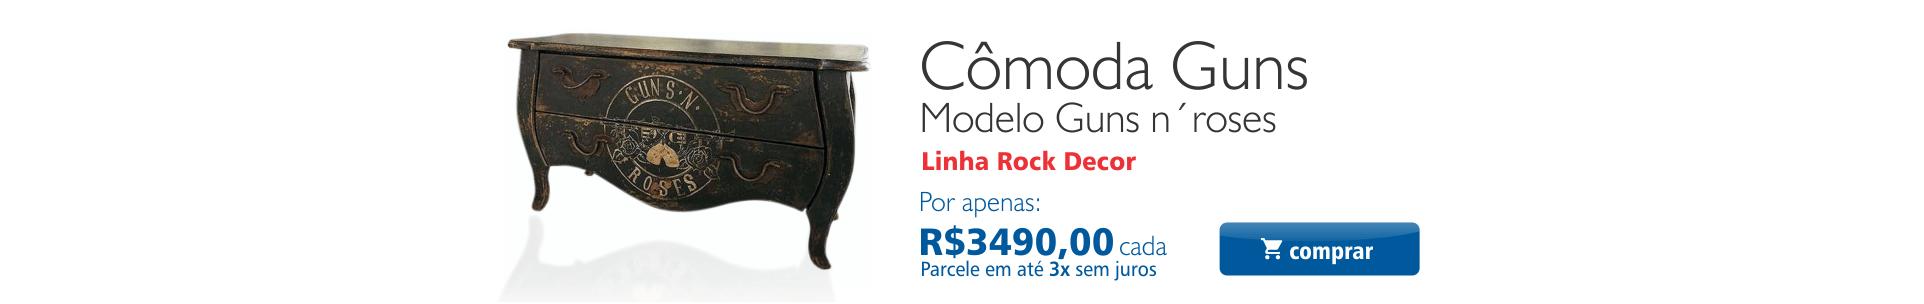 cômoda guns